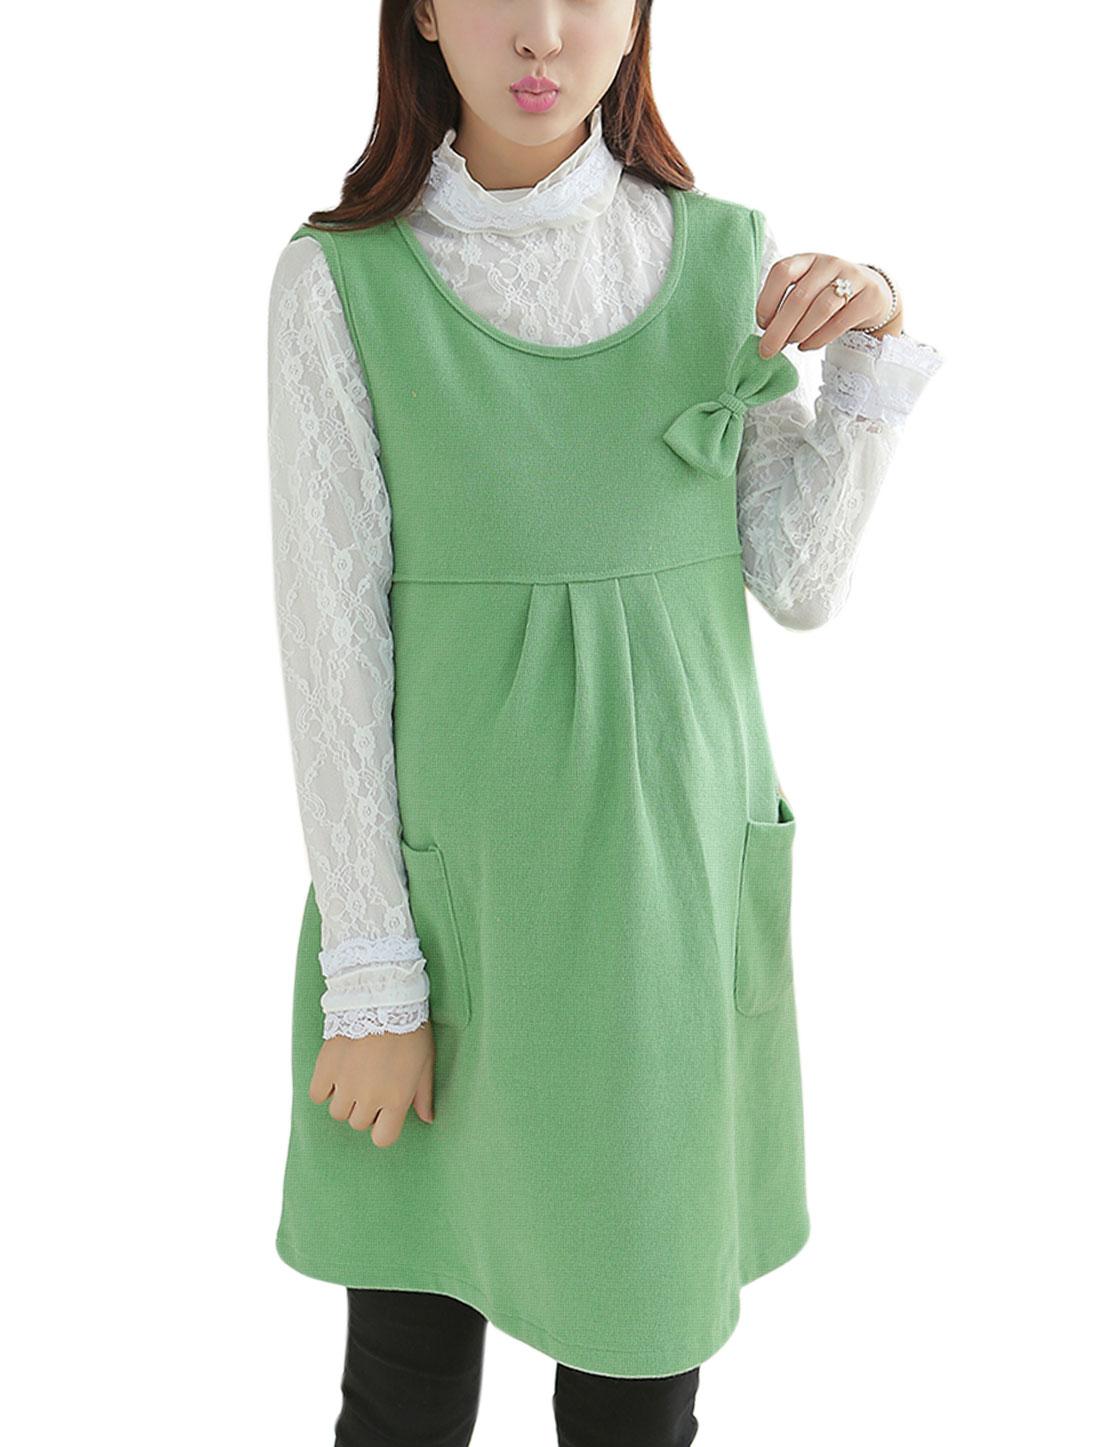 Maternity Bowknot Decor Bust Tie Strap Back Short Dress Light Green M